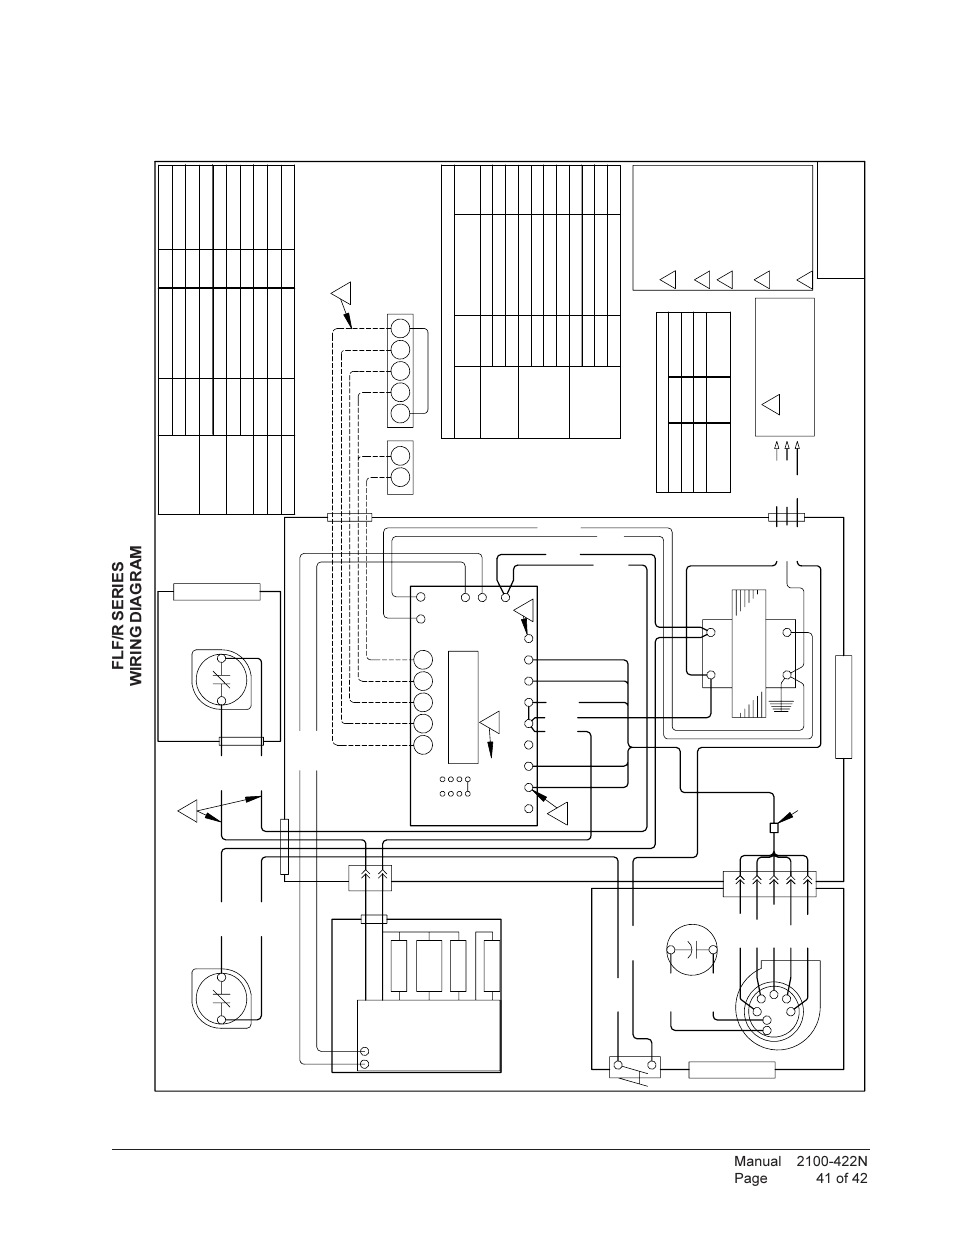 Th e rm osta t, Unit, Con d | Bard Oil Furnace FLF085D36F User ... Bard Oil Furnace Wiring Diagrams on oil furnace thermostat, oil furnace troubleshooting, oil furnace door, fuel oil furnace diagram, home furnace diagram, oil furnace tools, oil primary control wiring, oil furnace controls, oil burner schematic, oil furnace motor, oil furnace blower, oil furnace valve, oil furnace operation diagram, oil furnace won't start, gas furnace diagram, oil furnace assembly, oil furnace installation, oil furnace piping diagram, oil furnace water pump,